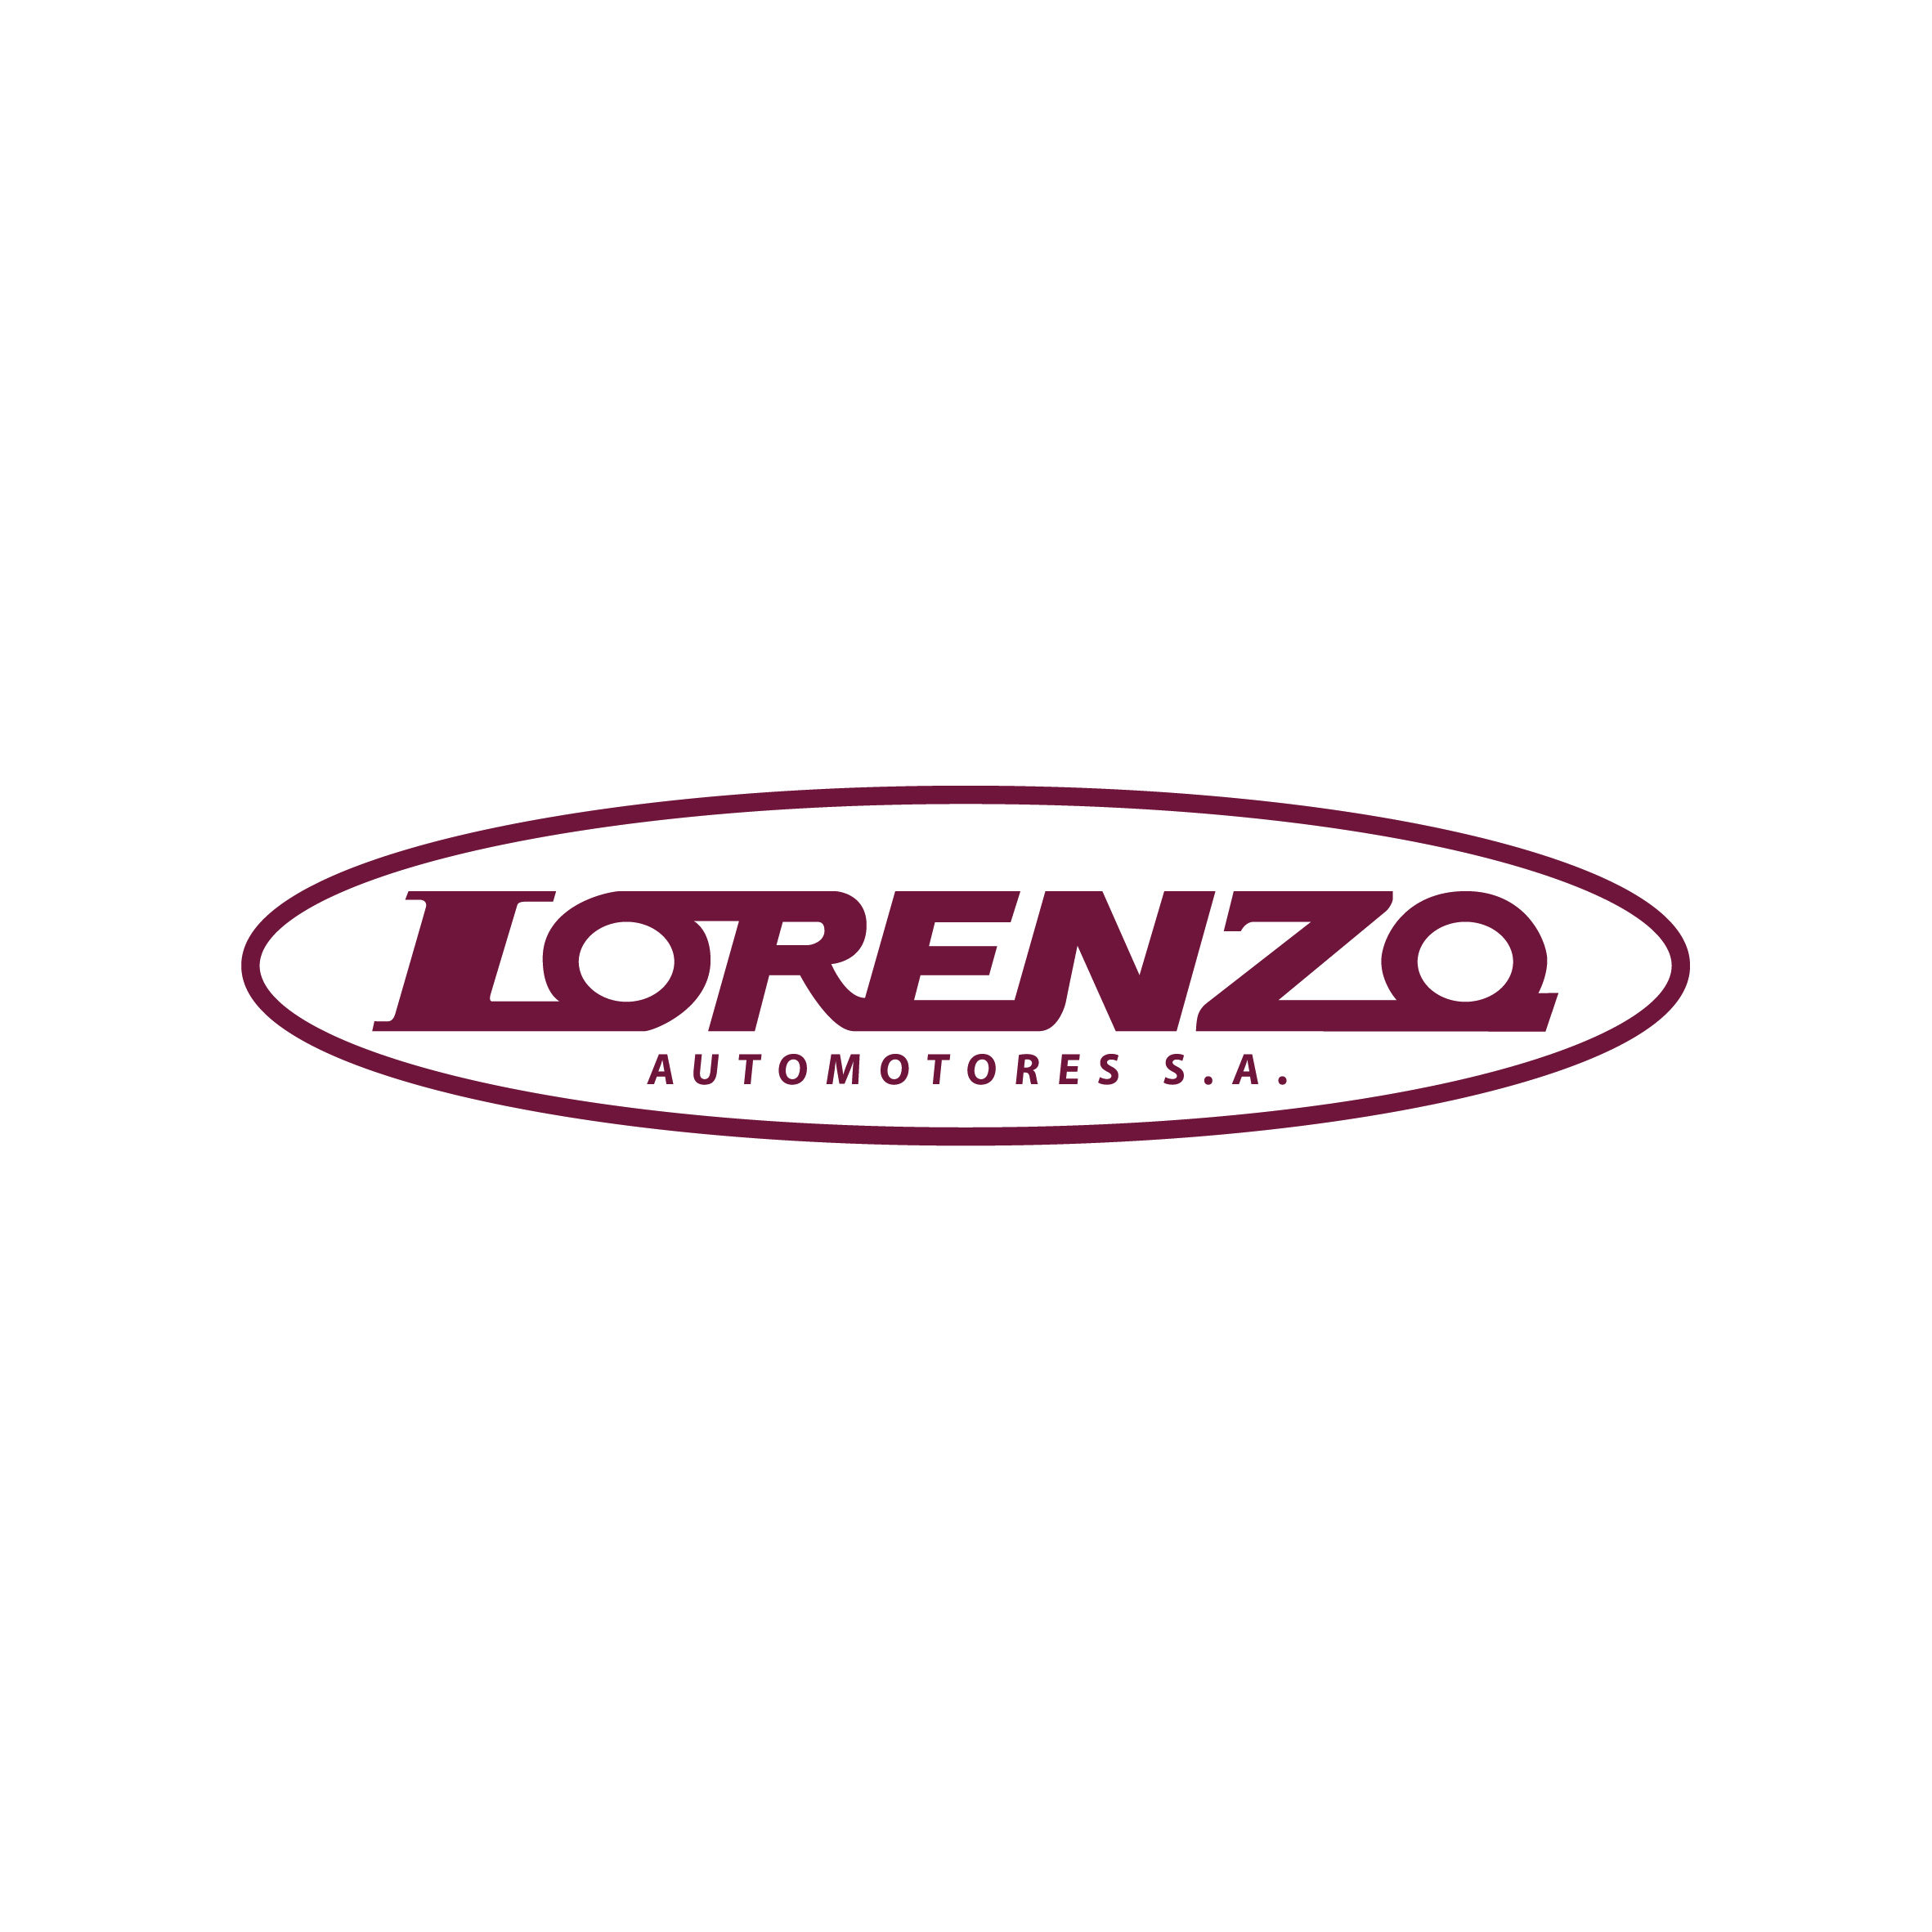 LORENZO AUTOMOTORES - Lorenzo